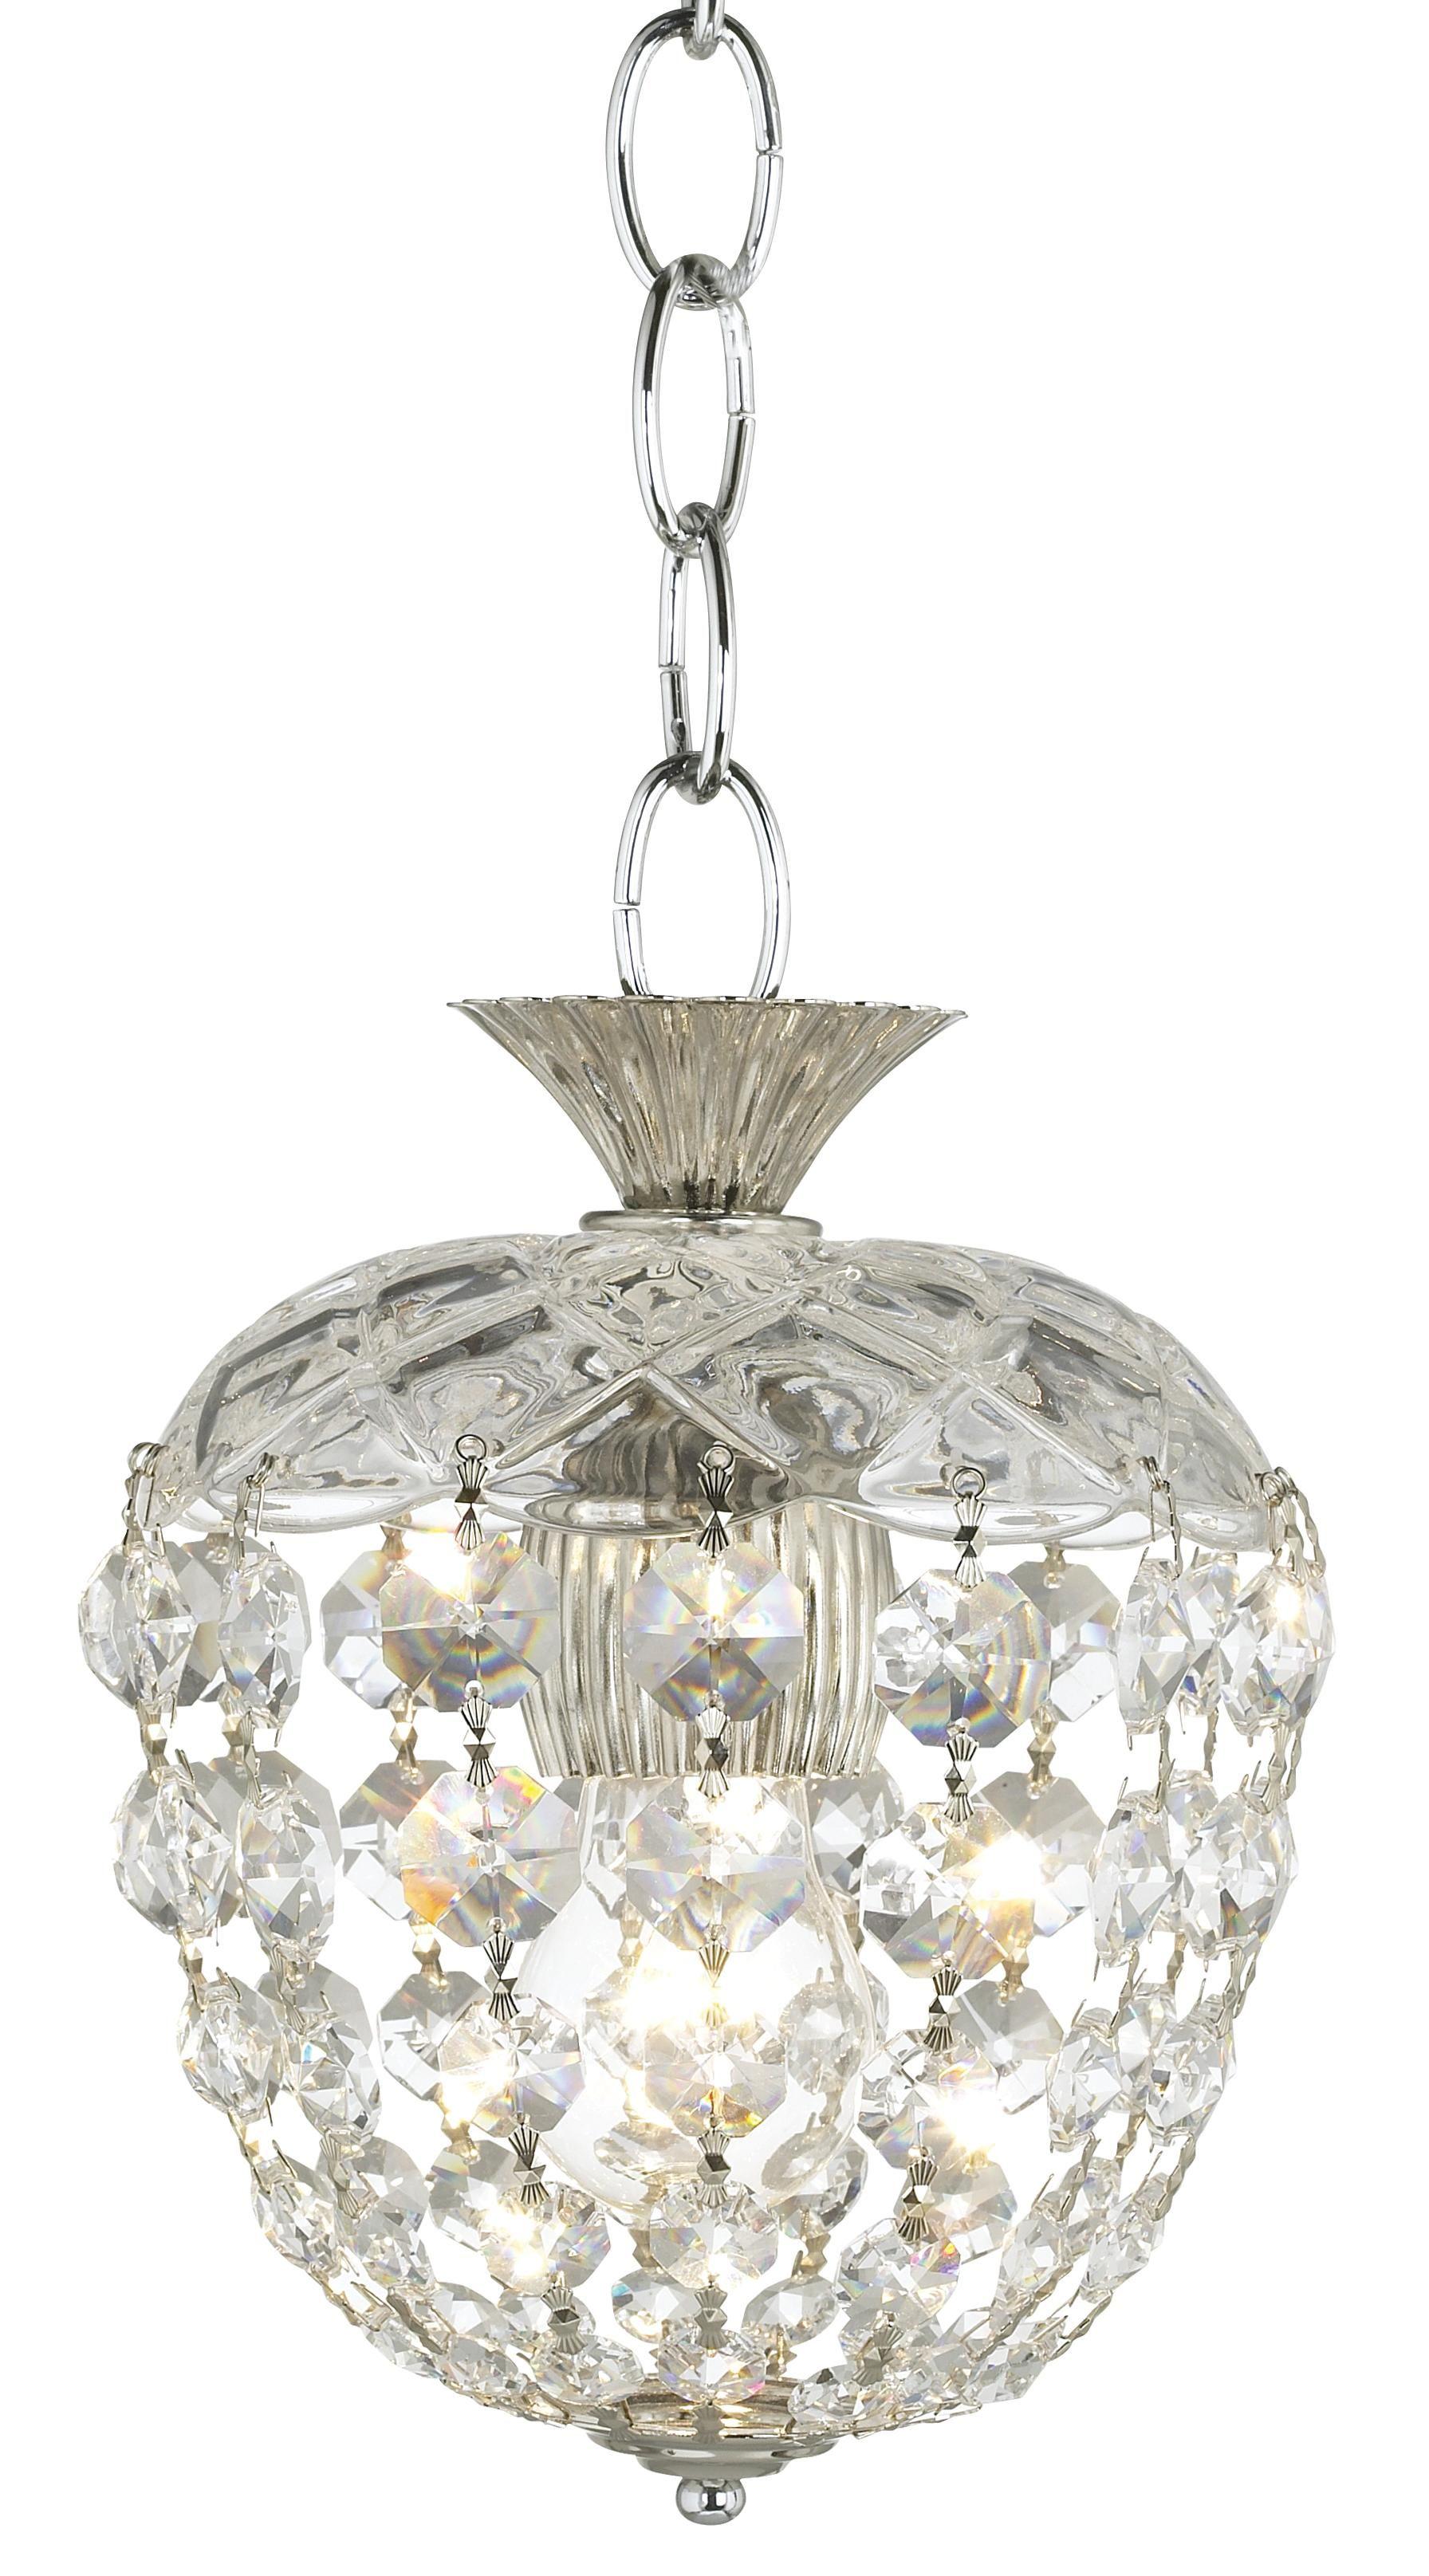 James r moder granada crystal minipendant chandelier style